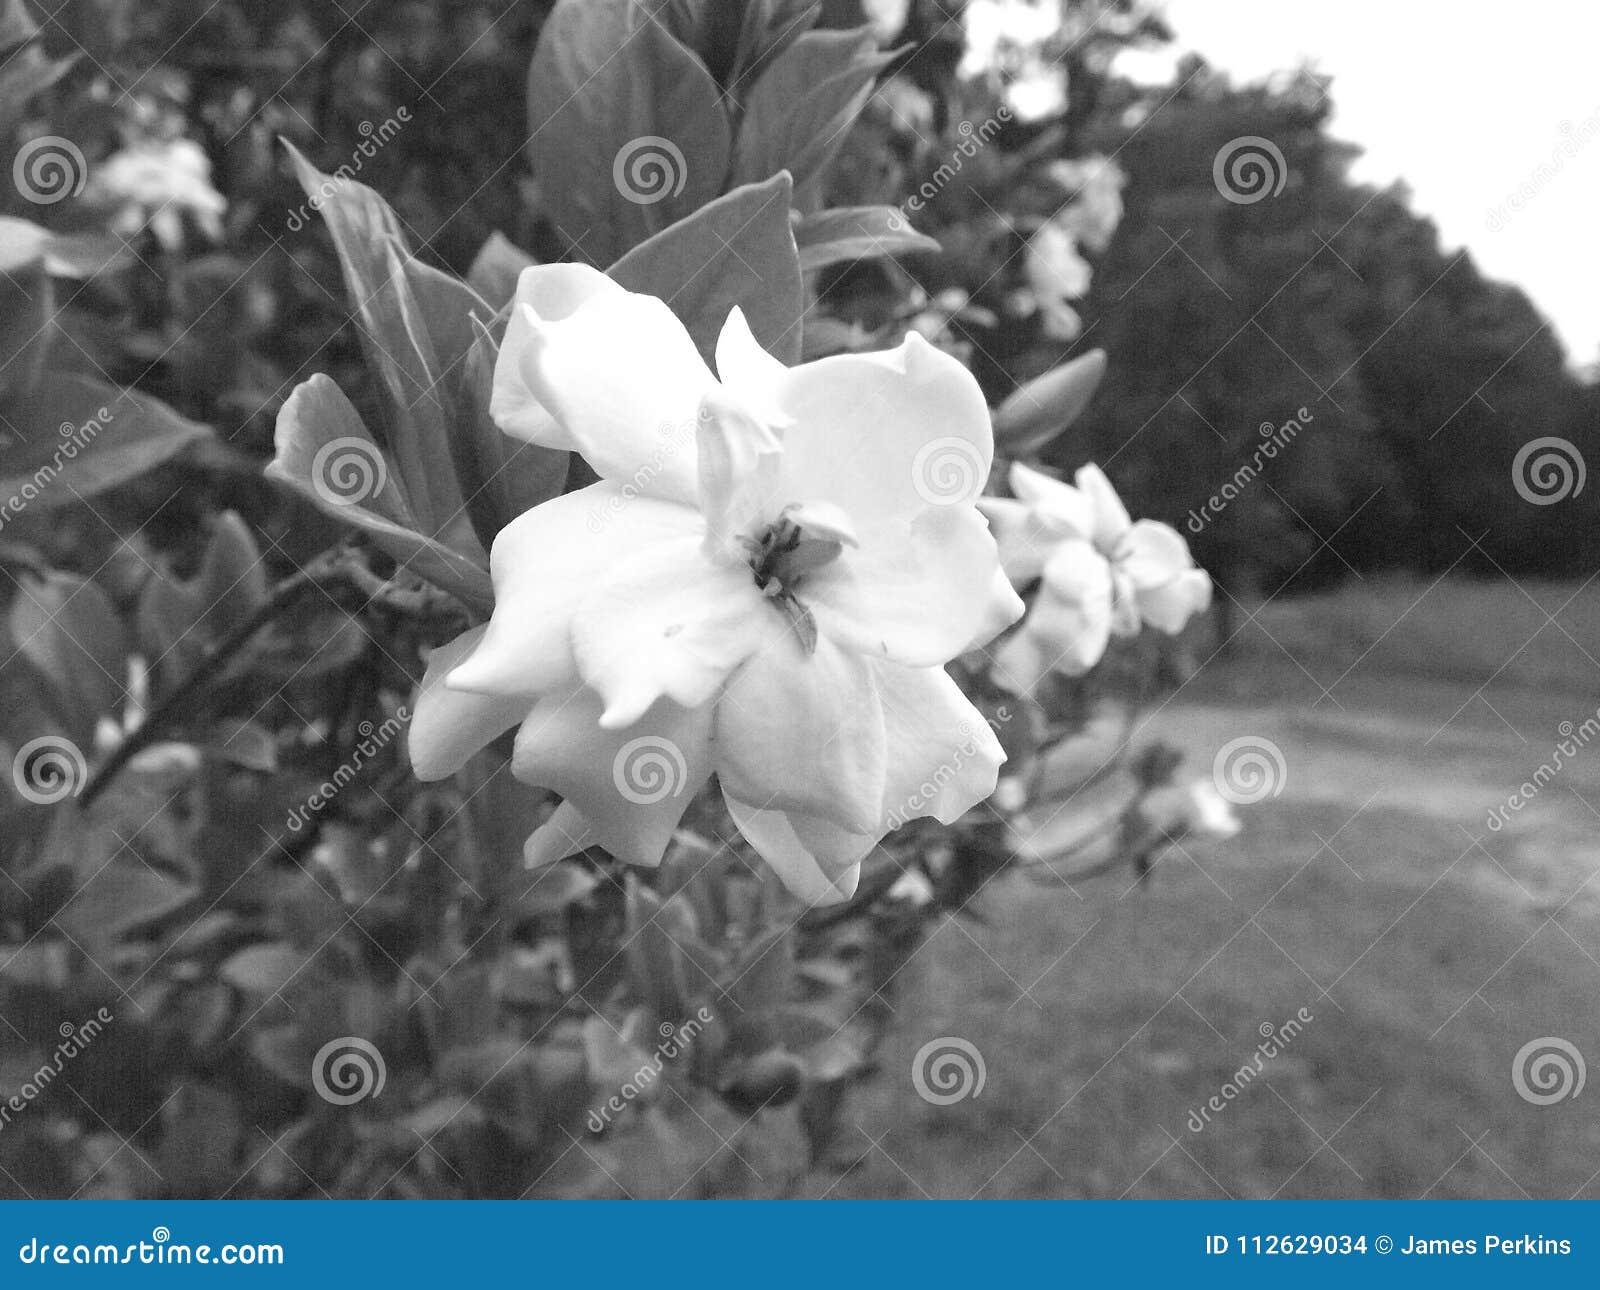 Black and White Gardenia flower